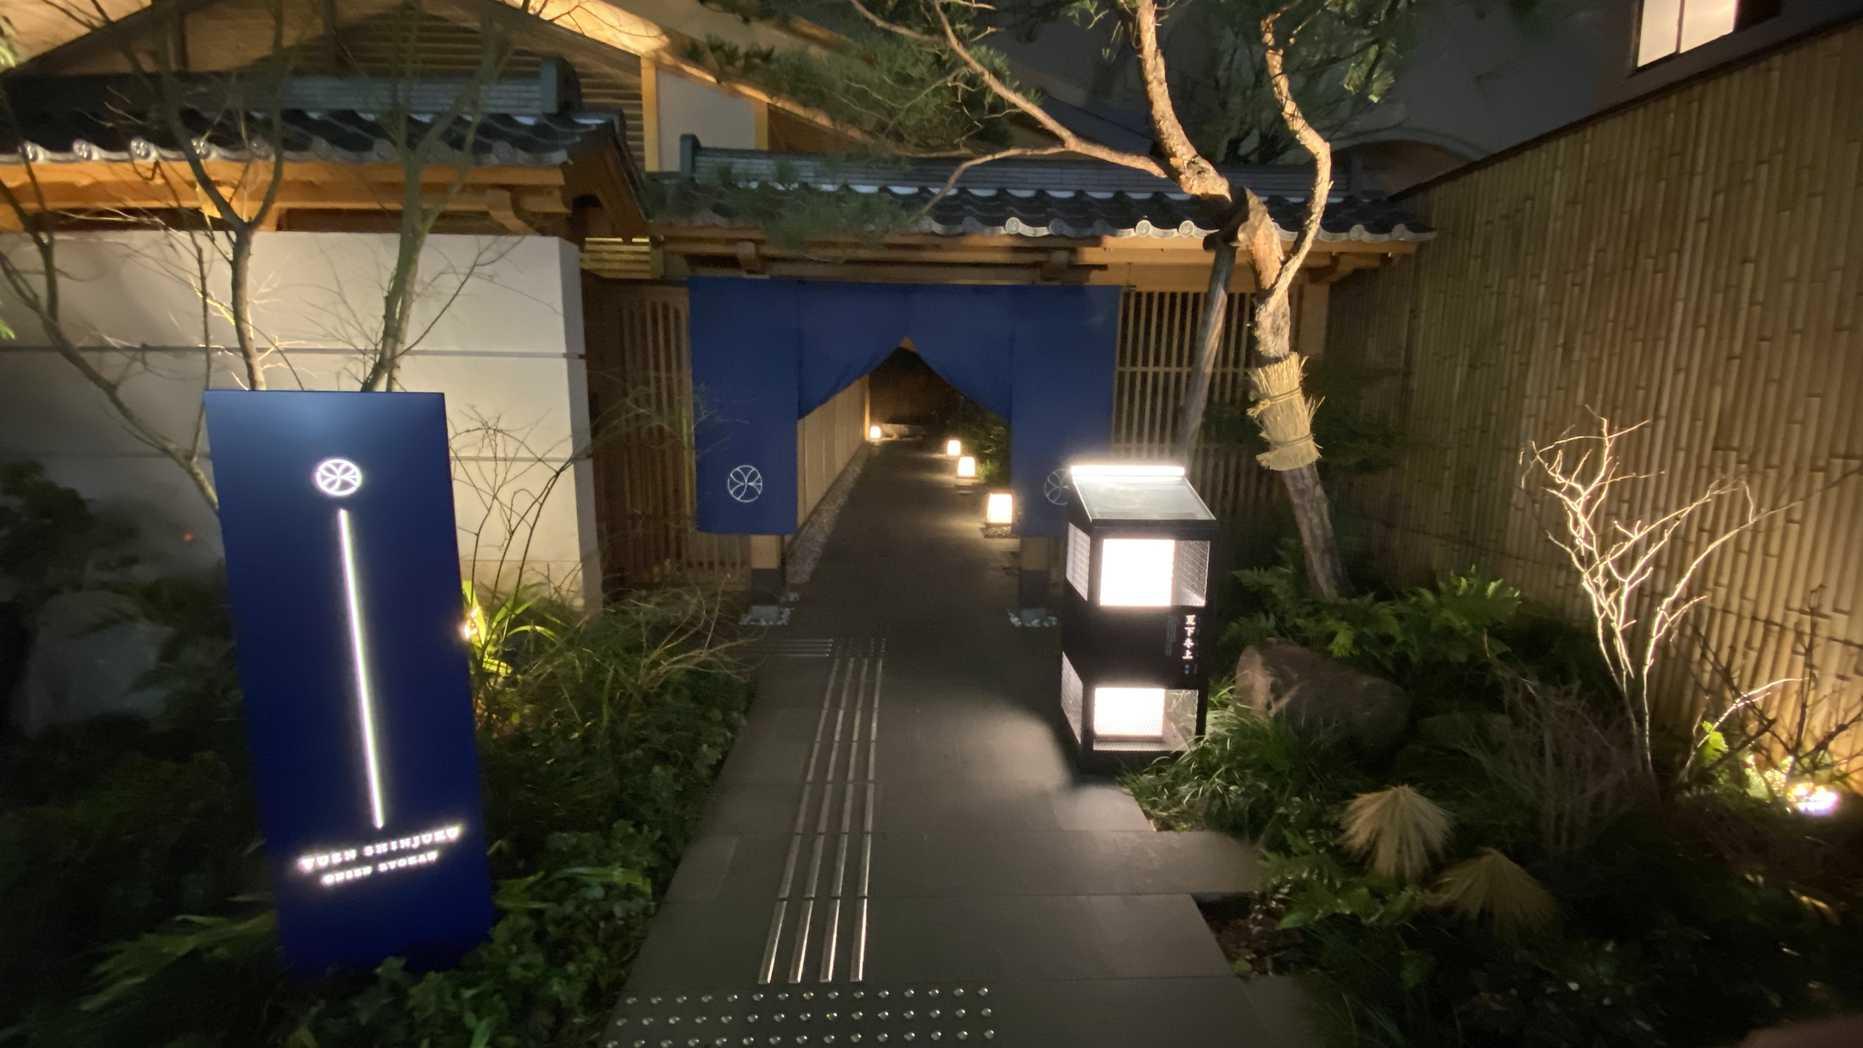 ONSEN RYOKAN 由縁 新宿の外観